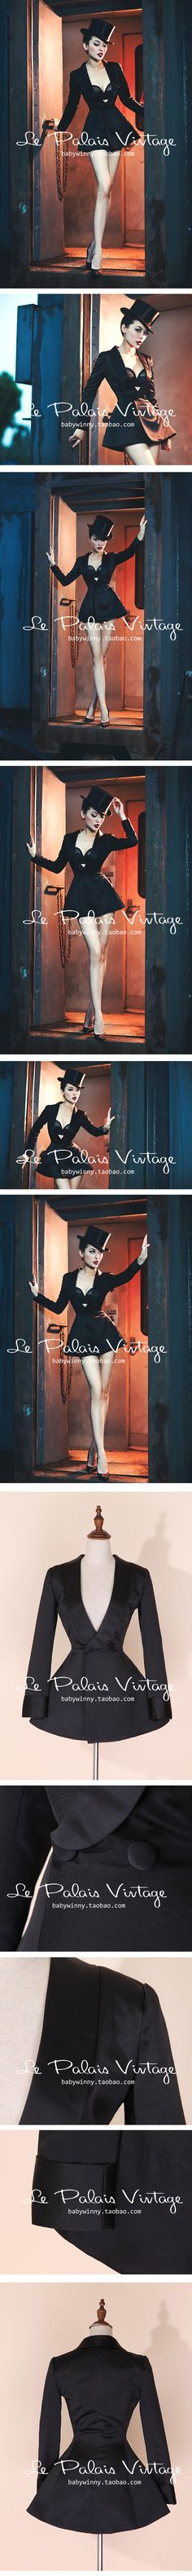 le palais vintage优雅经典显瘦绸缎收腰裙摆式西装外套吸烟装0.4-淘宝网